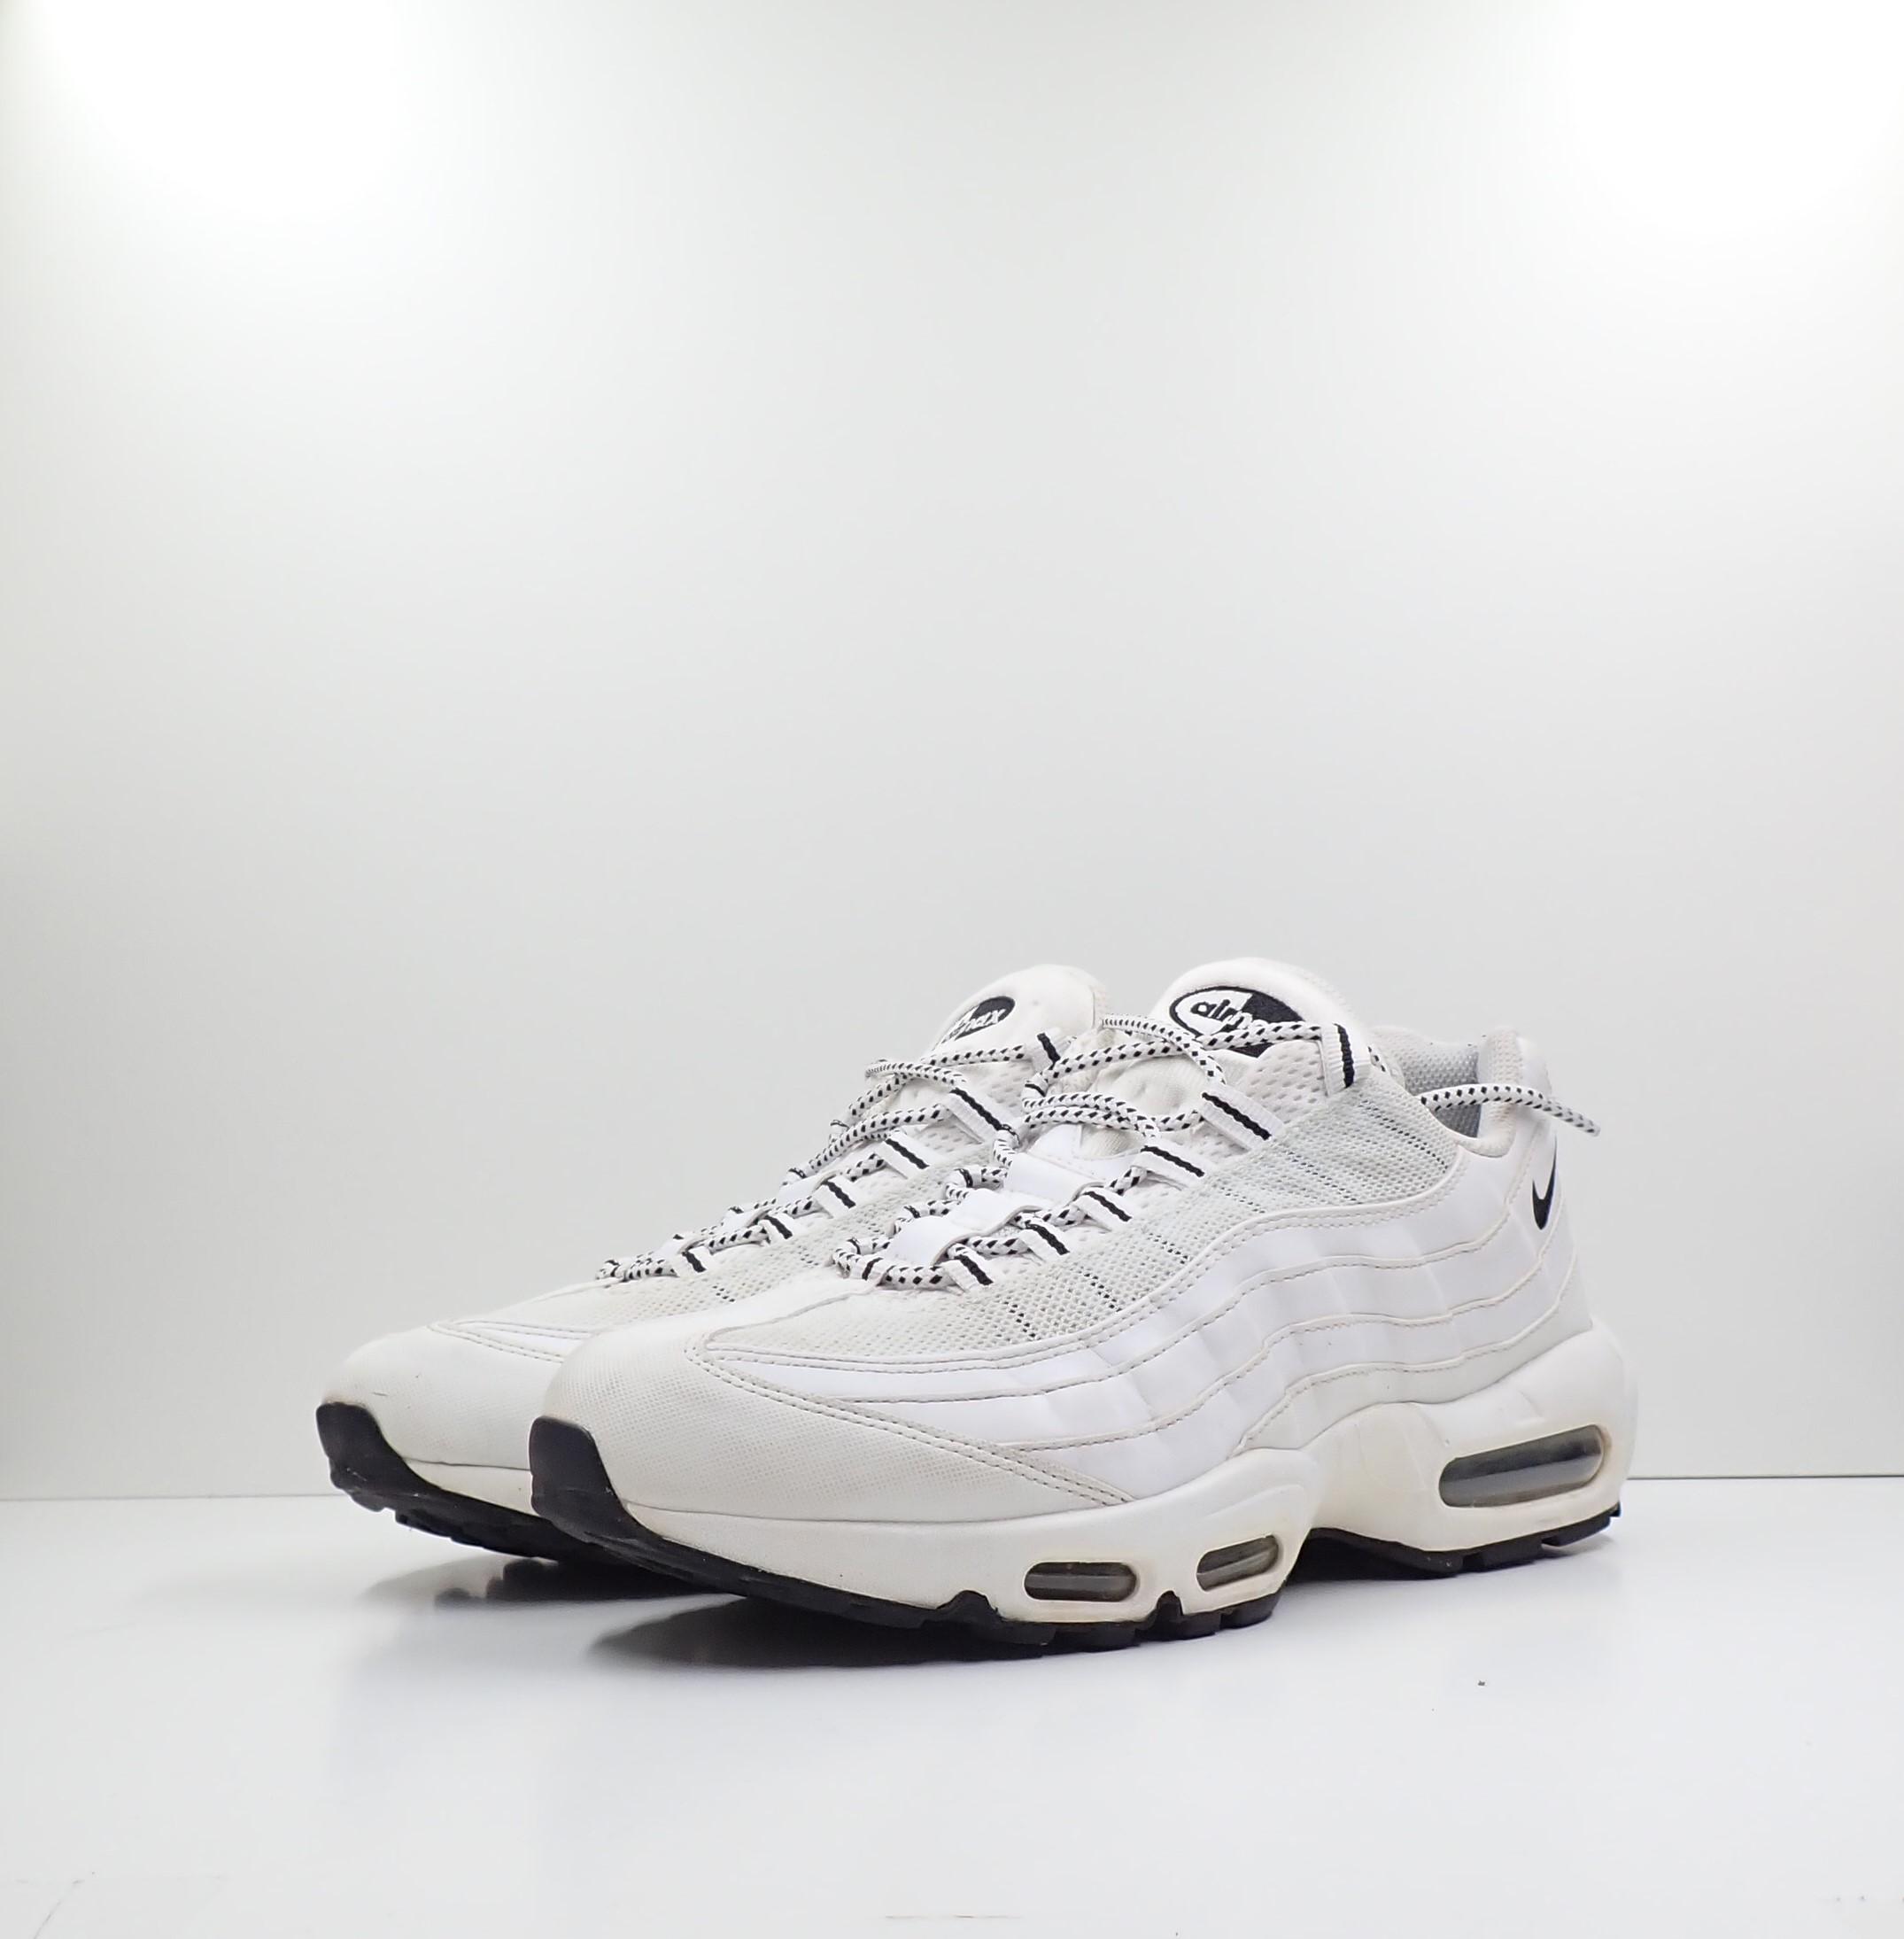 Nike Air Max 95 White Black